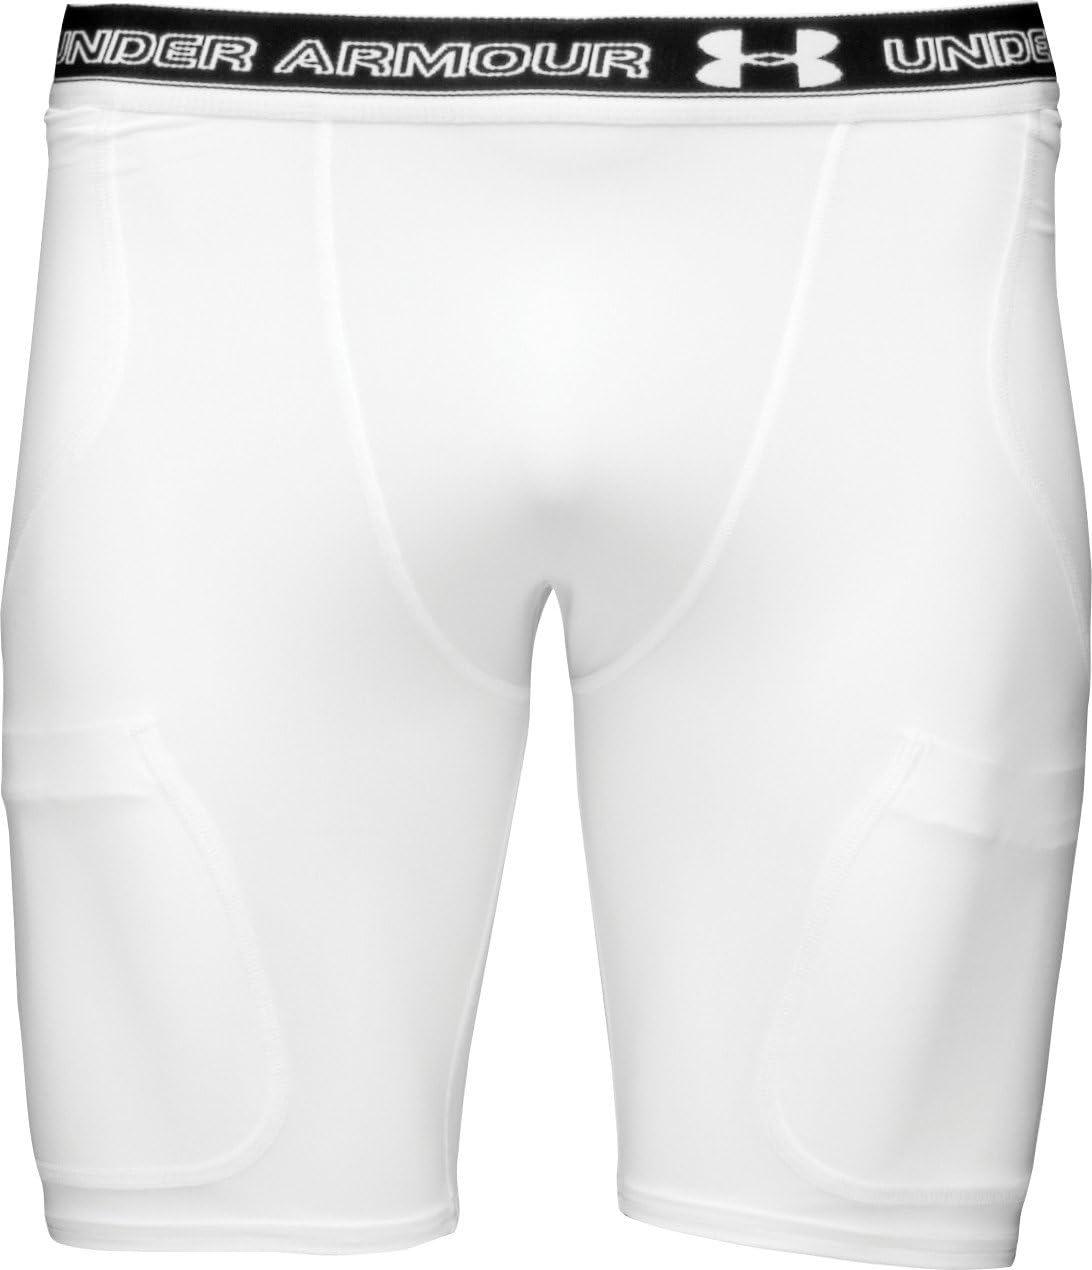 Under Armour Mens Six Pocket Girdle White/Black Size XXL: Amazon.es: Deportes y aire libre